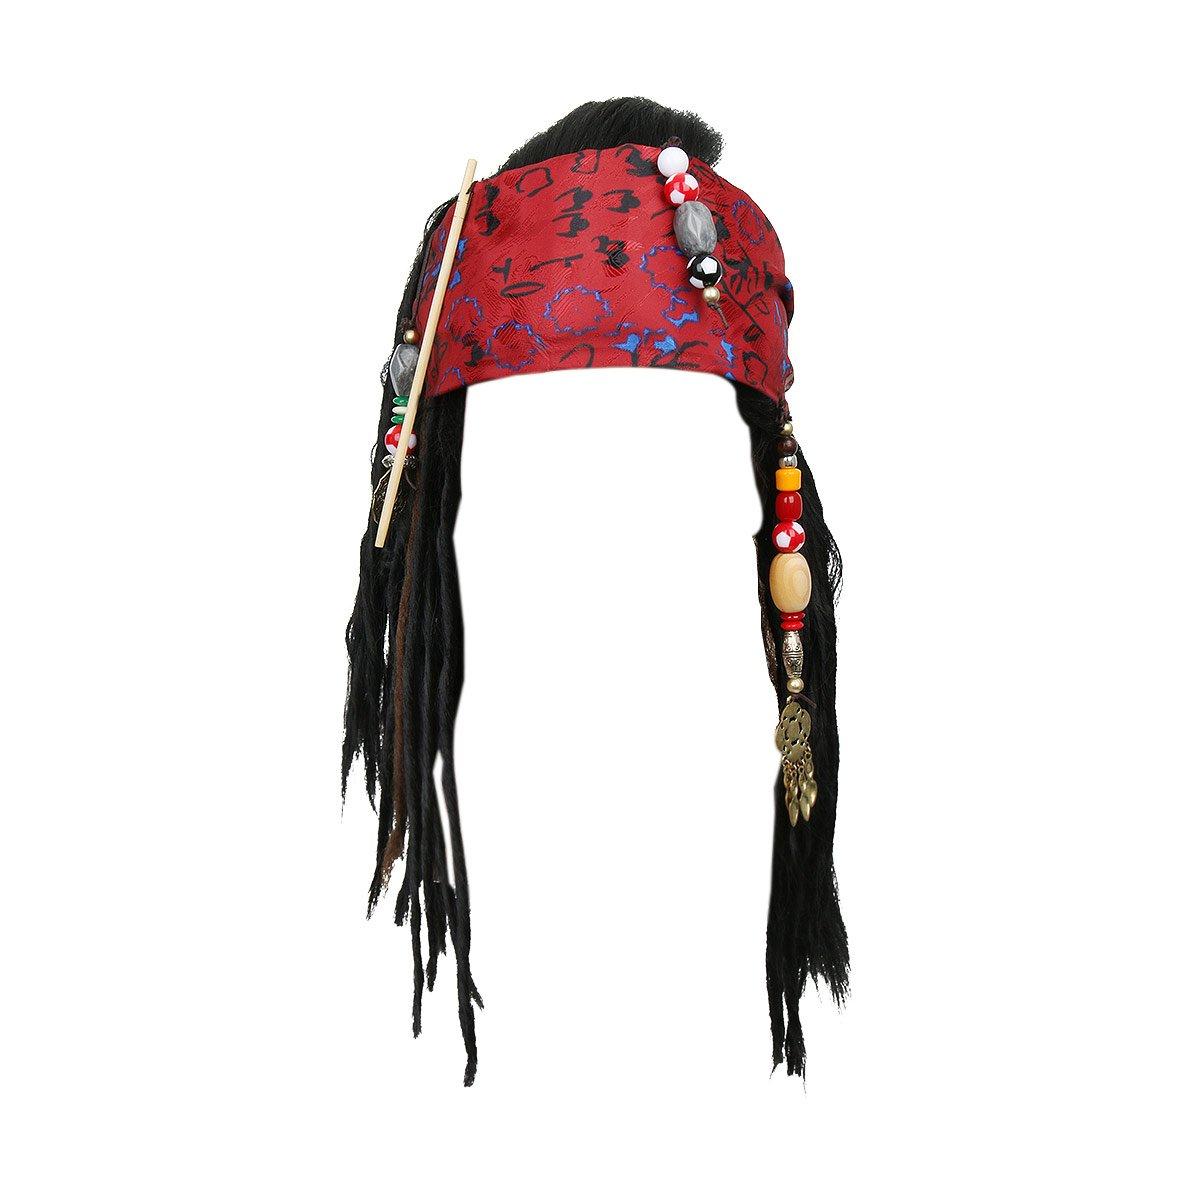 Pirates Wigs Bandana Dreadlock DLX Jack Sparrow Halloween Costume